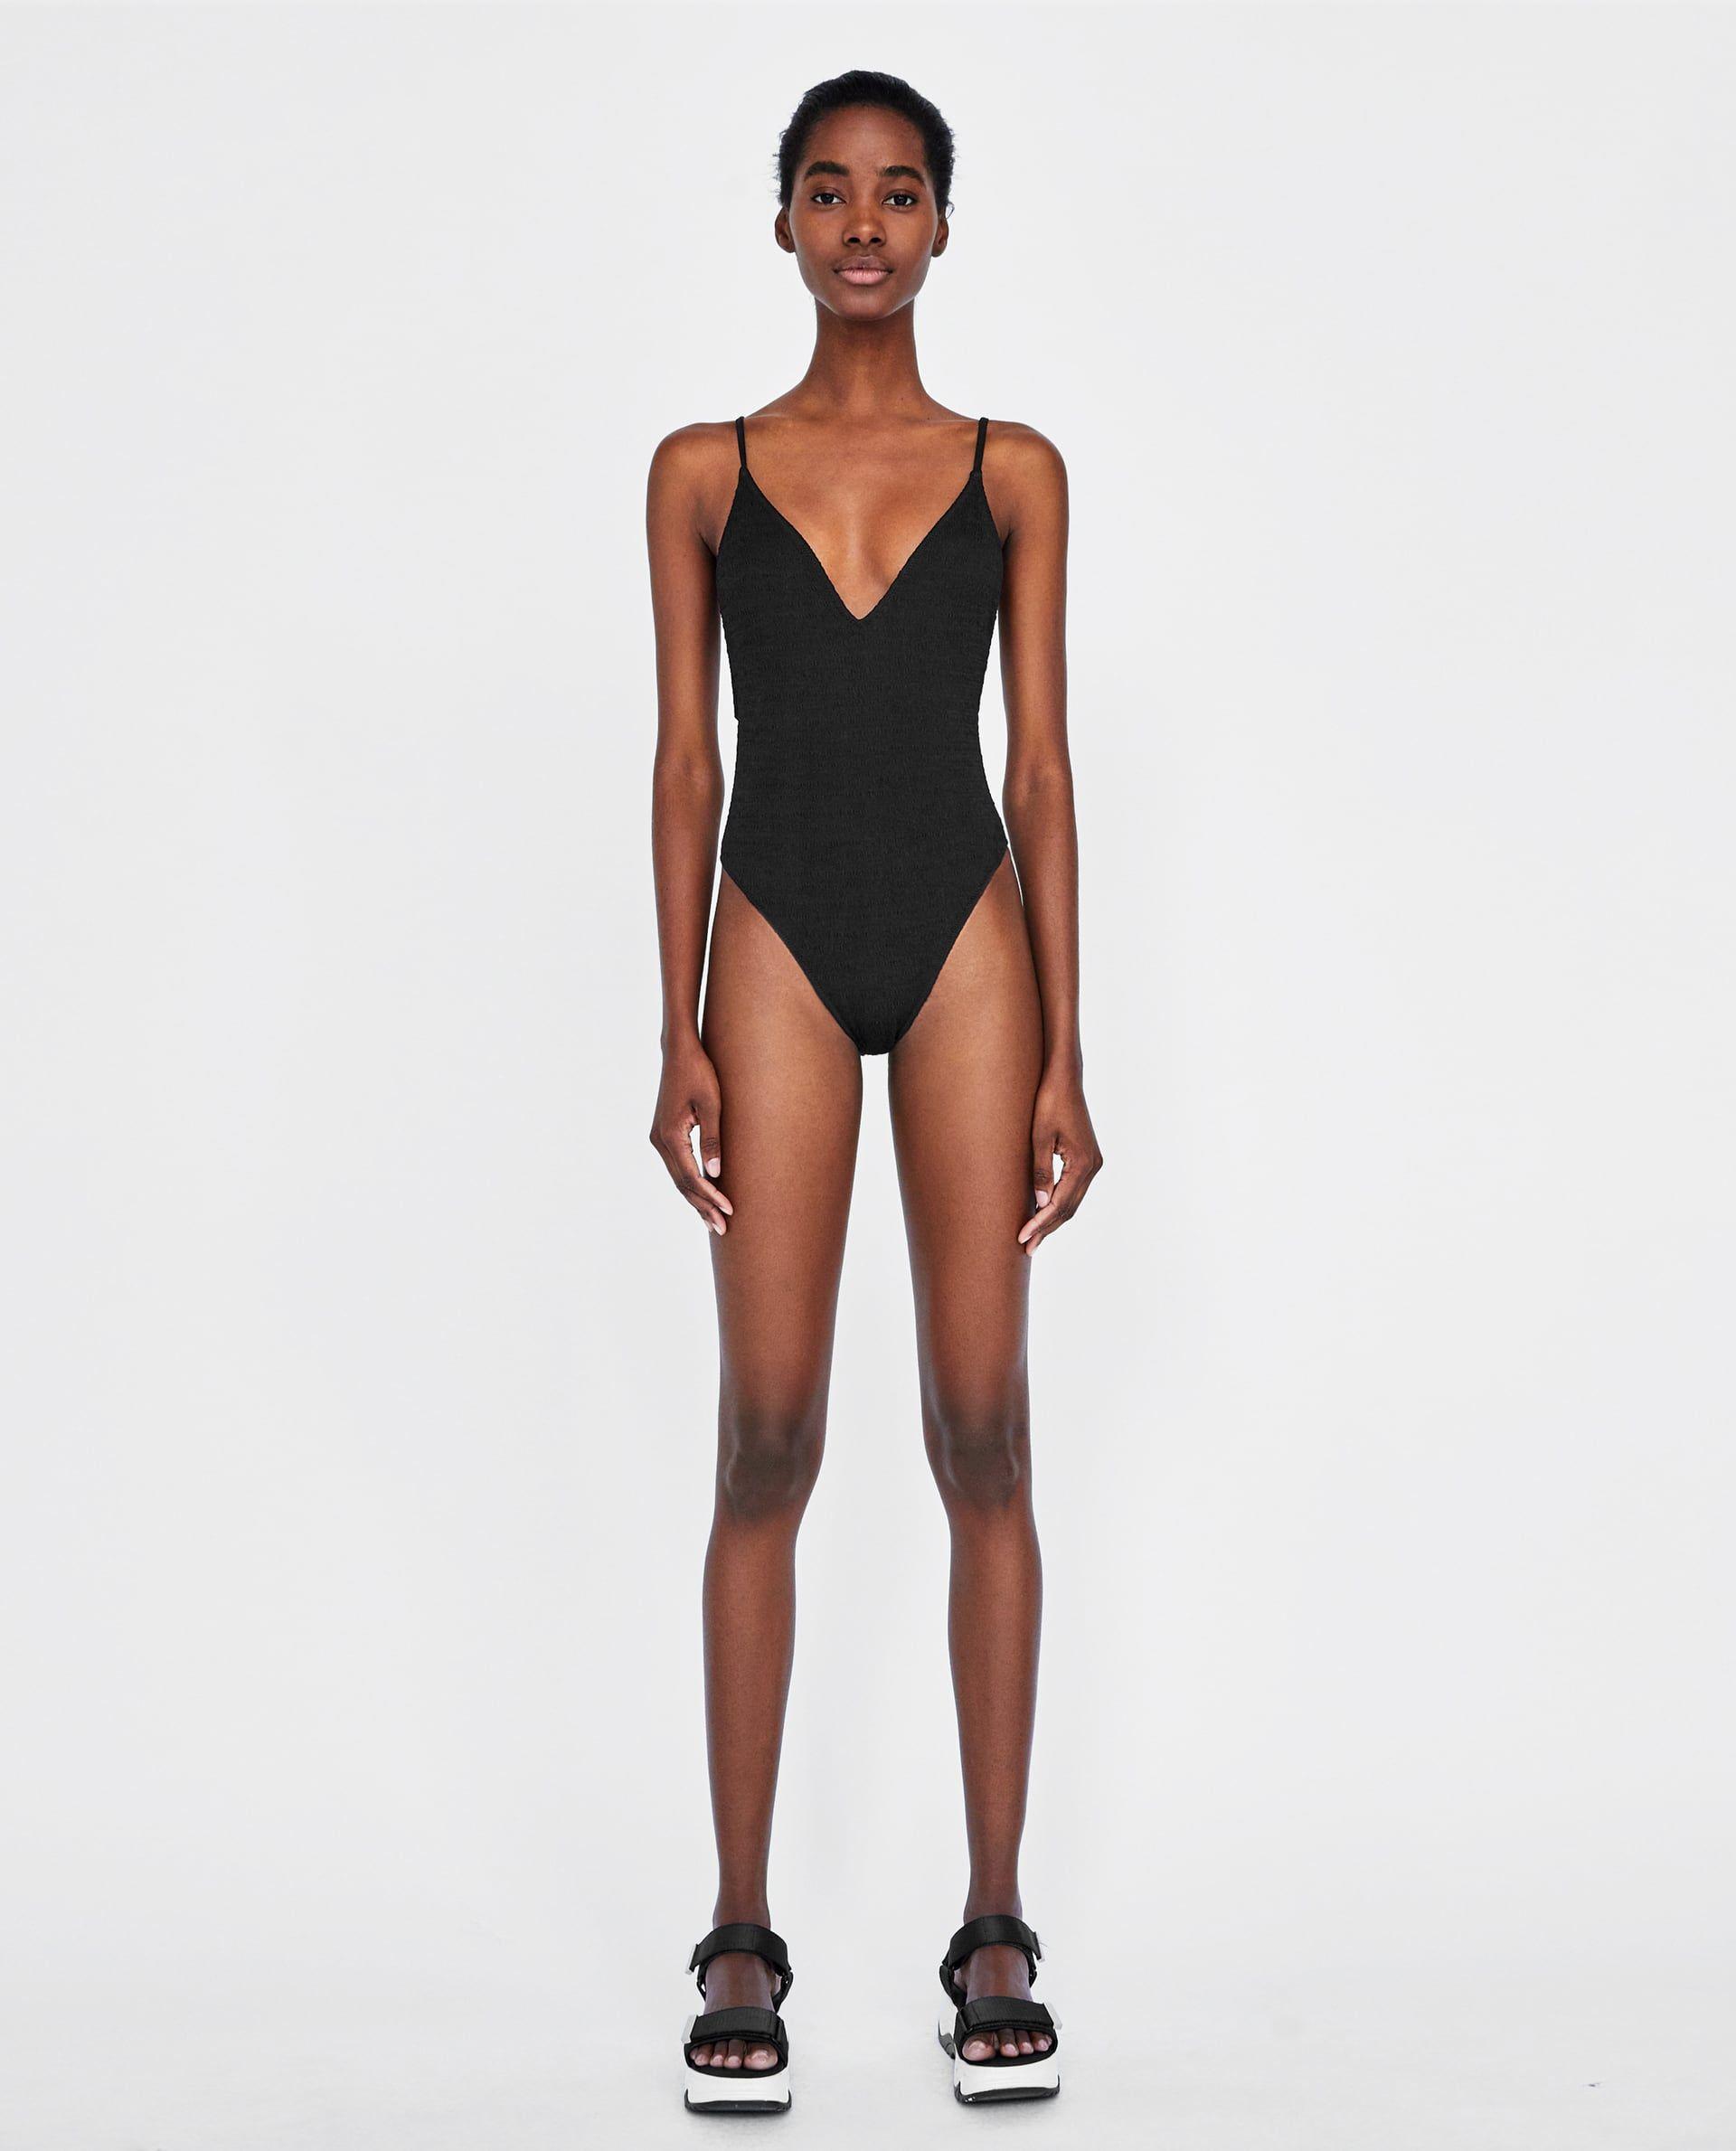 7932ca07f6 Image 1 of TEXTURED WEAVE BIKINI BOTTOMS from Zara | Swimwear in 2019 |  Bikinis, Fashion sketches, Fashion figures